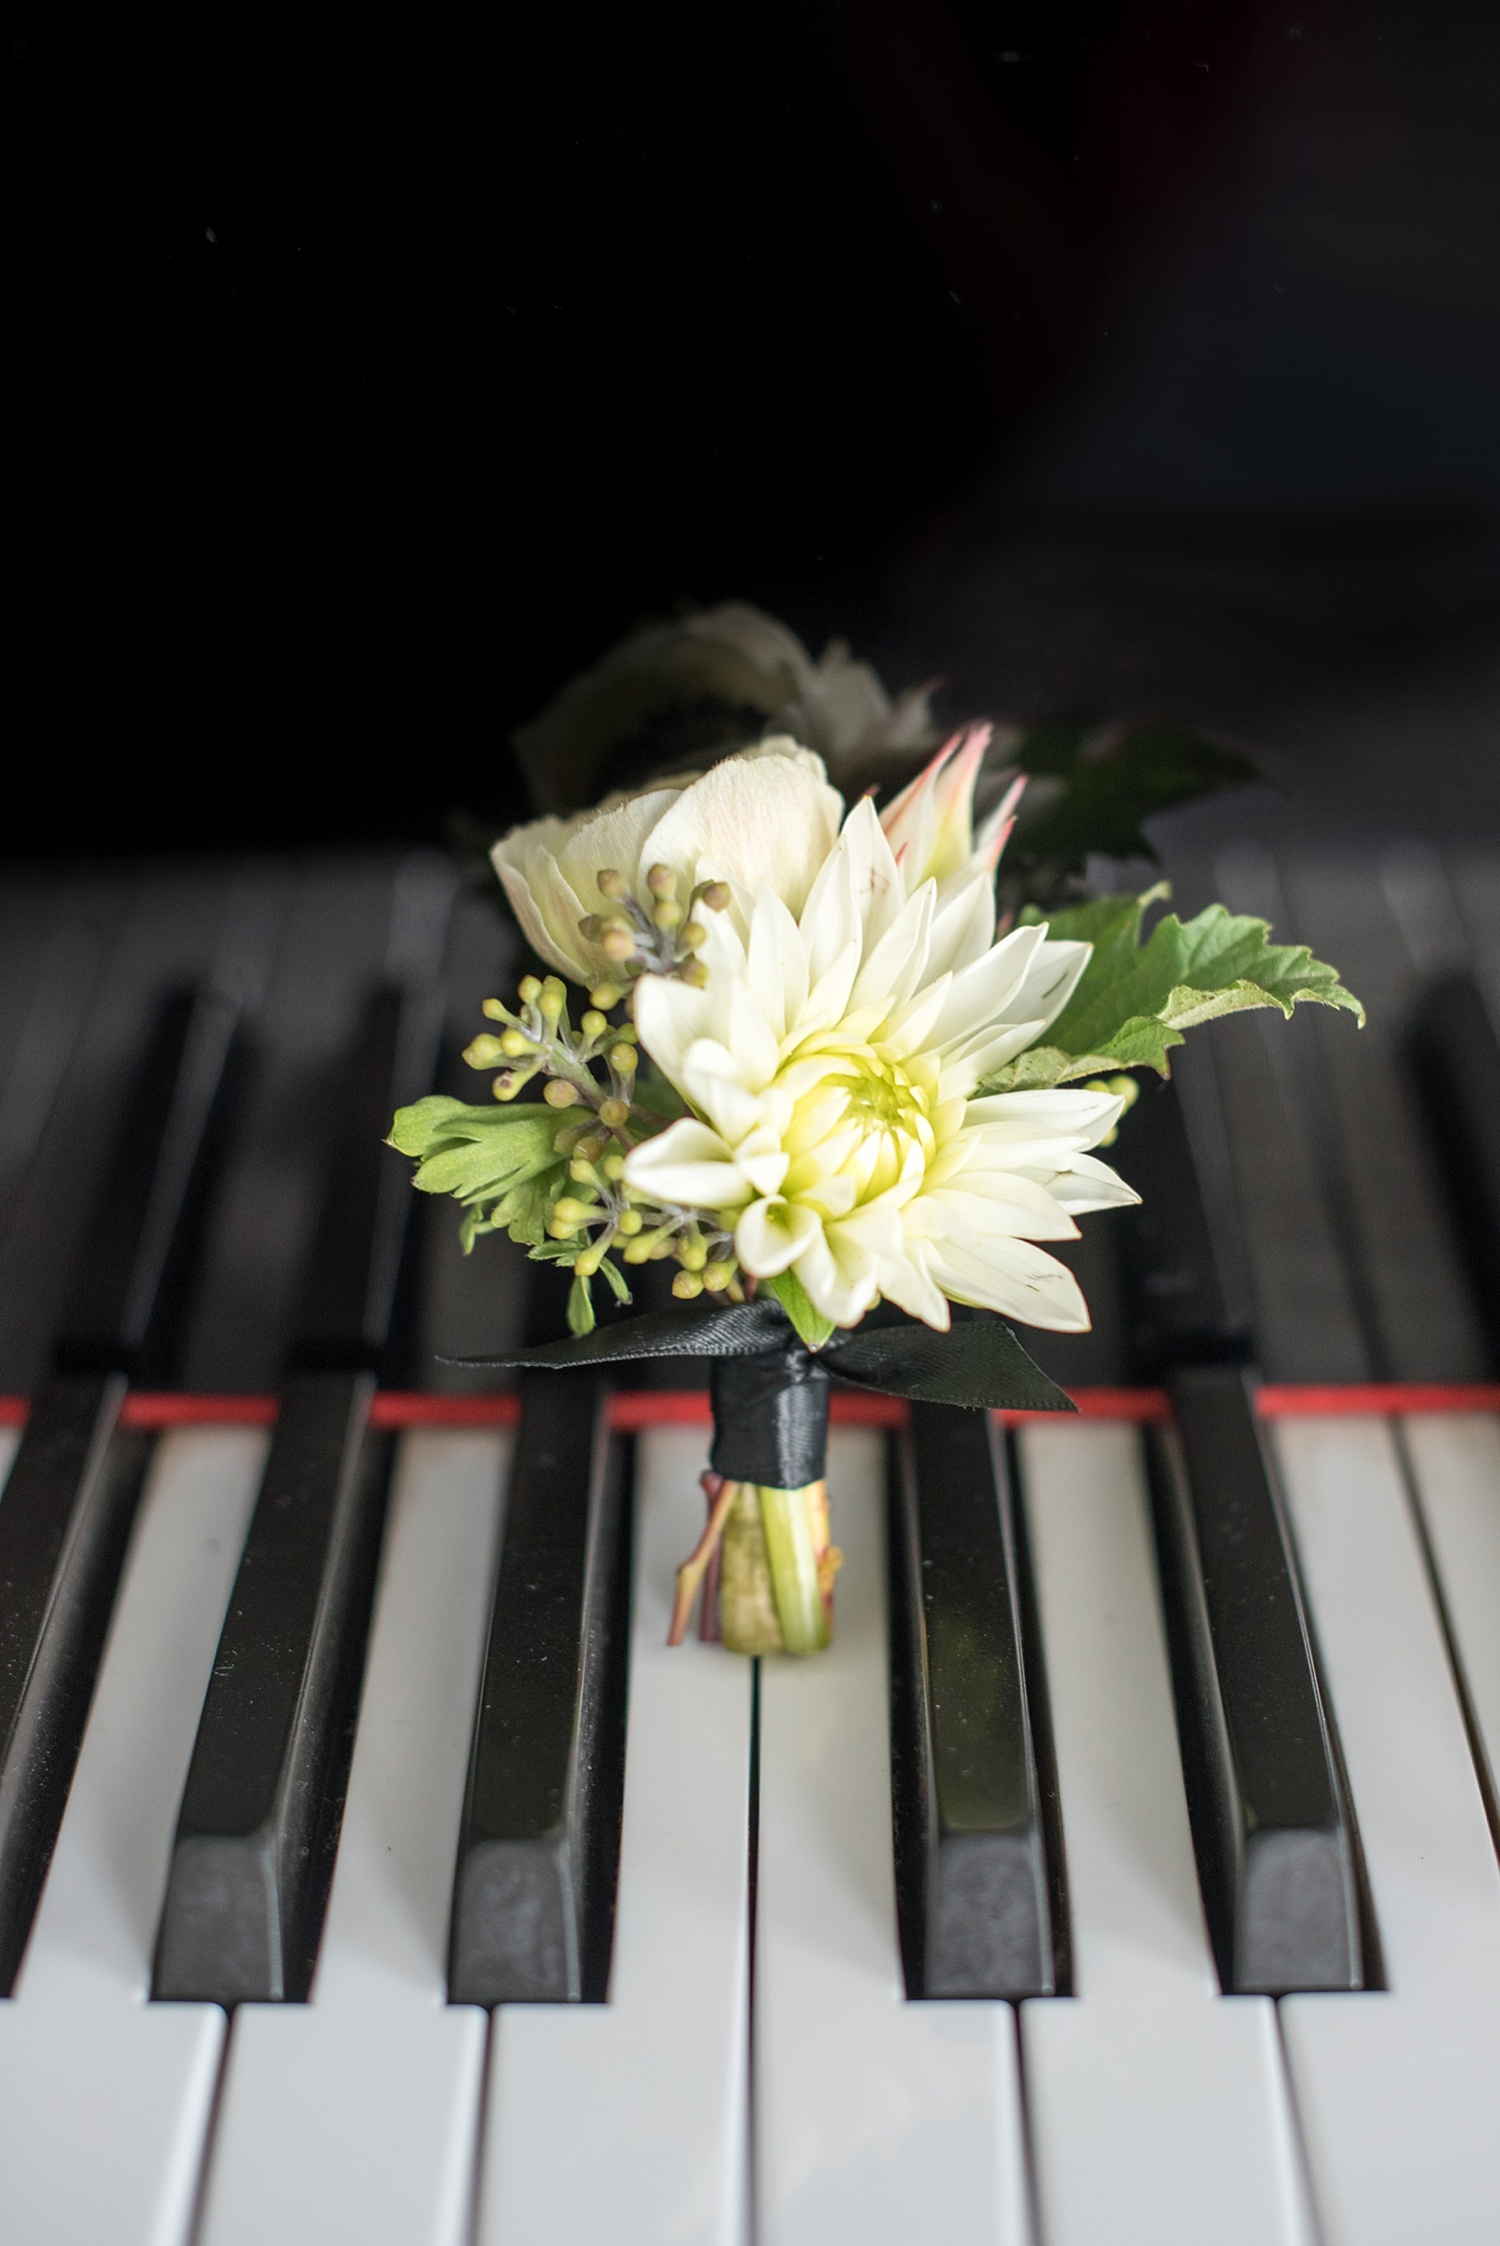 mikkelpaige-full_aperture_floral-pearl_river_hilton_wedding_0005.jpg